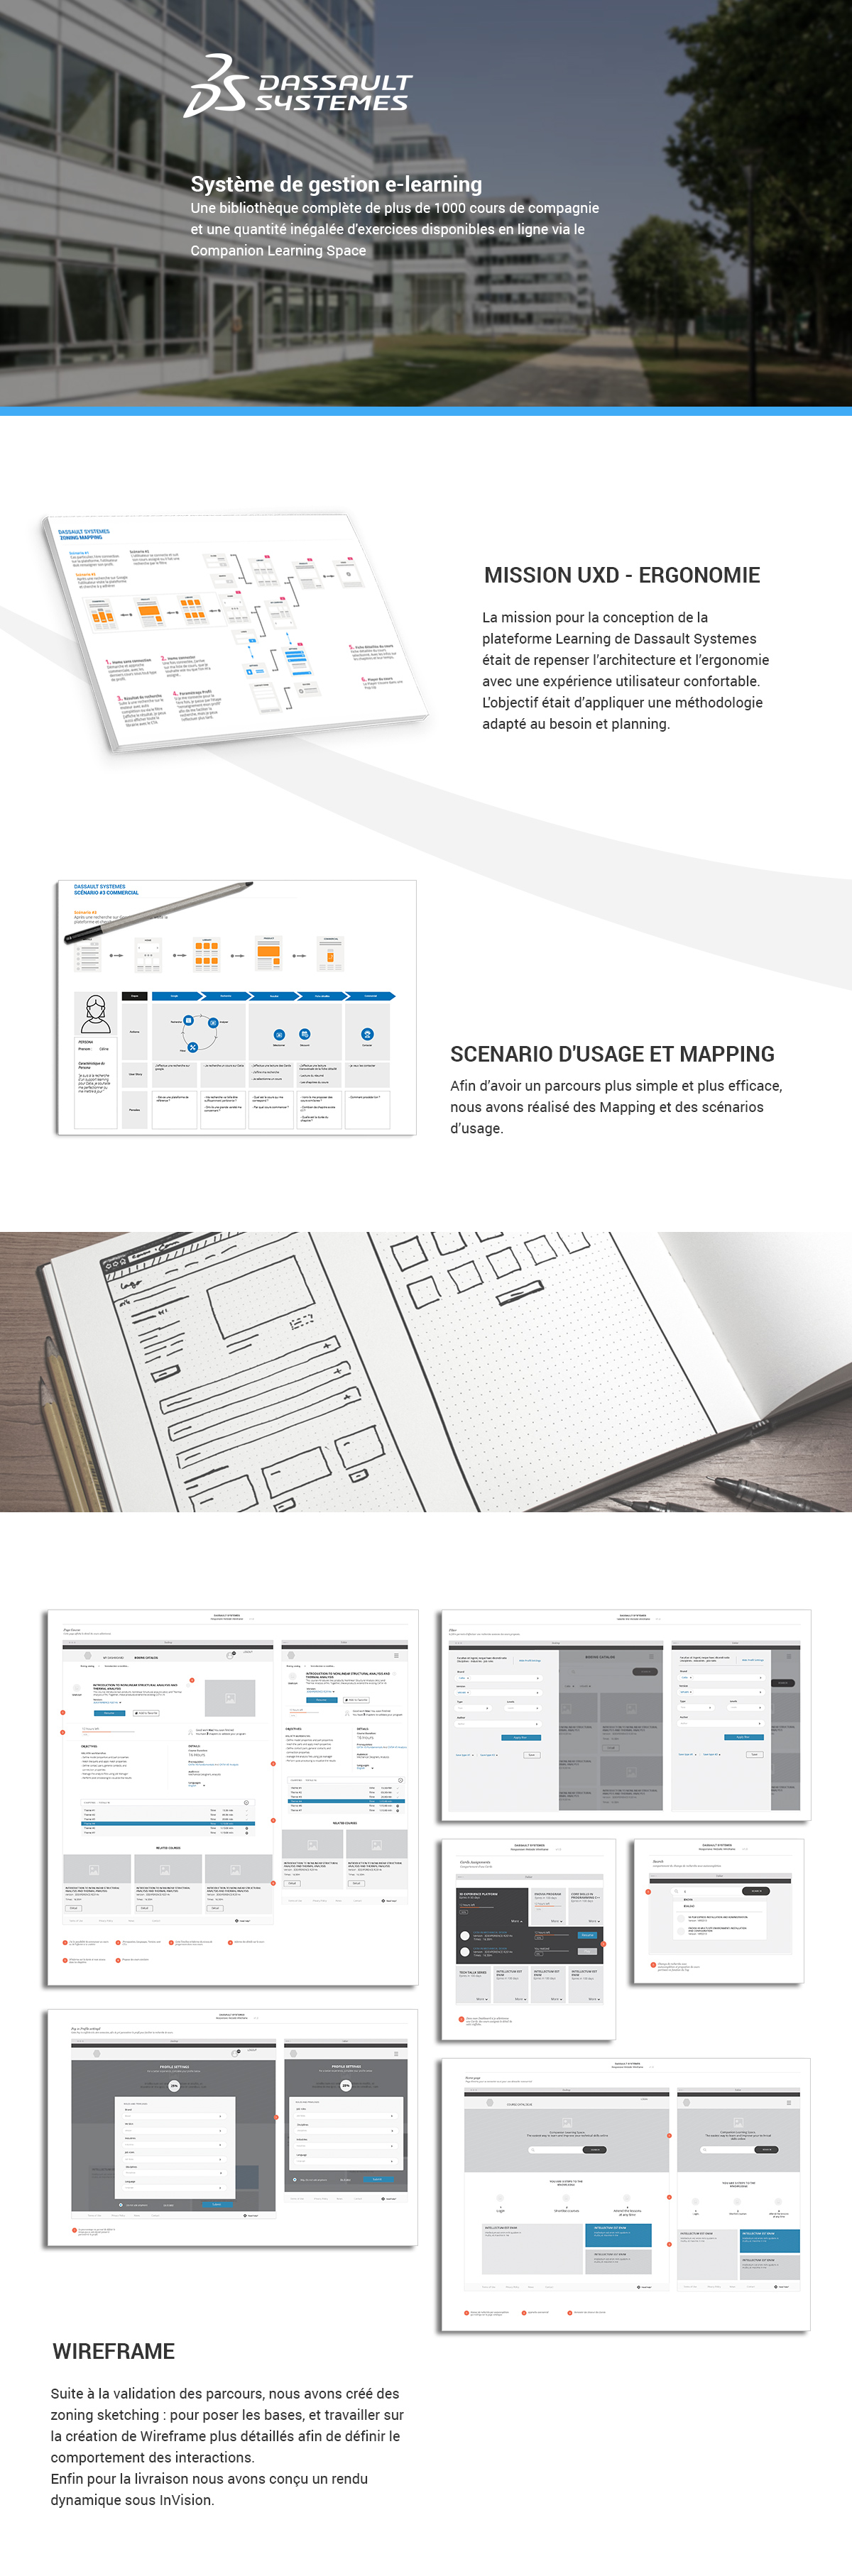 Ergonomie ux design freelance ergonome Scenario d'usage et mapping wireframe